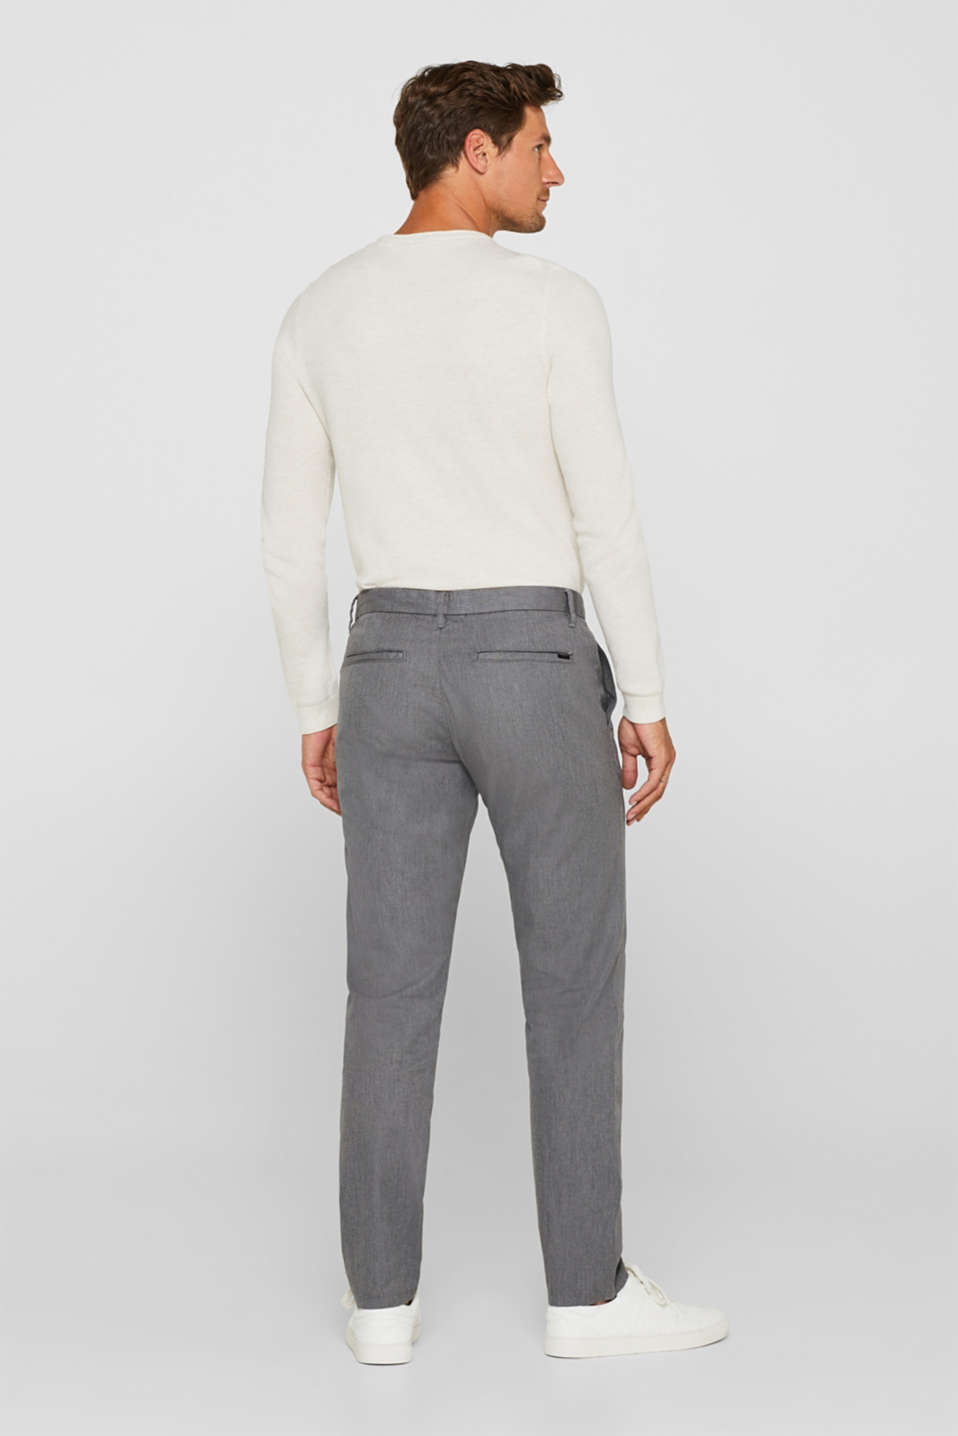 Pants woven Slim fit, GREY, detail image number 3